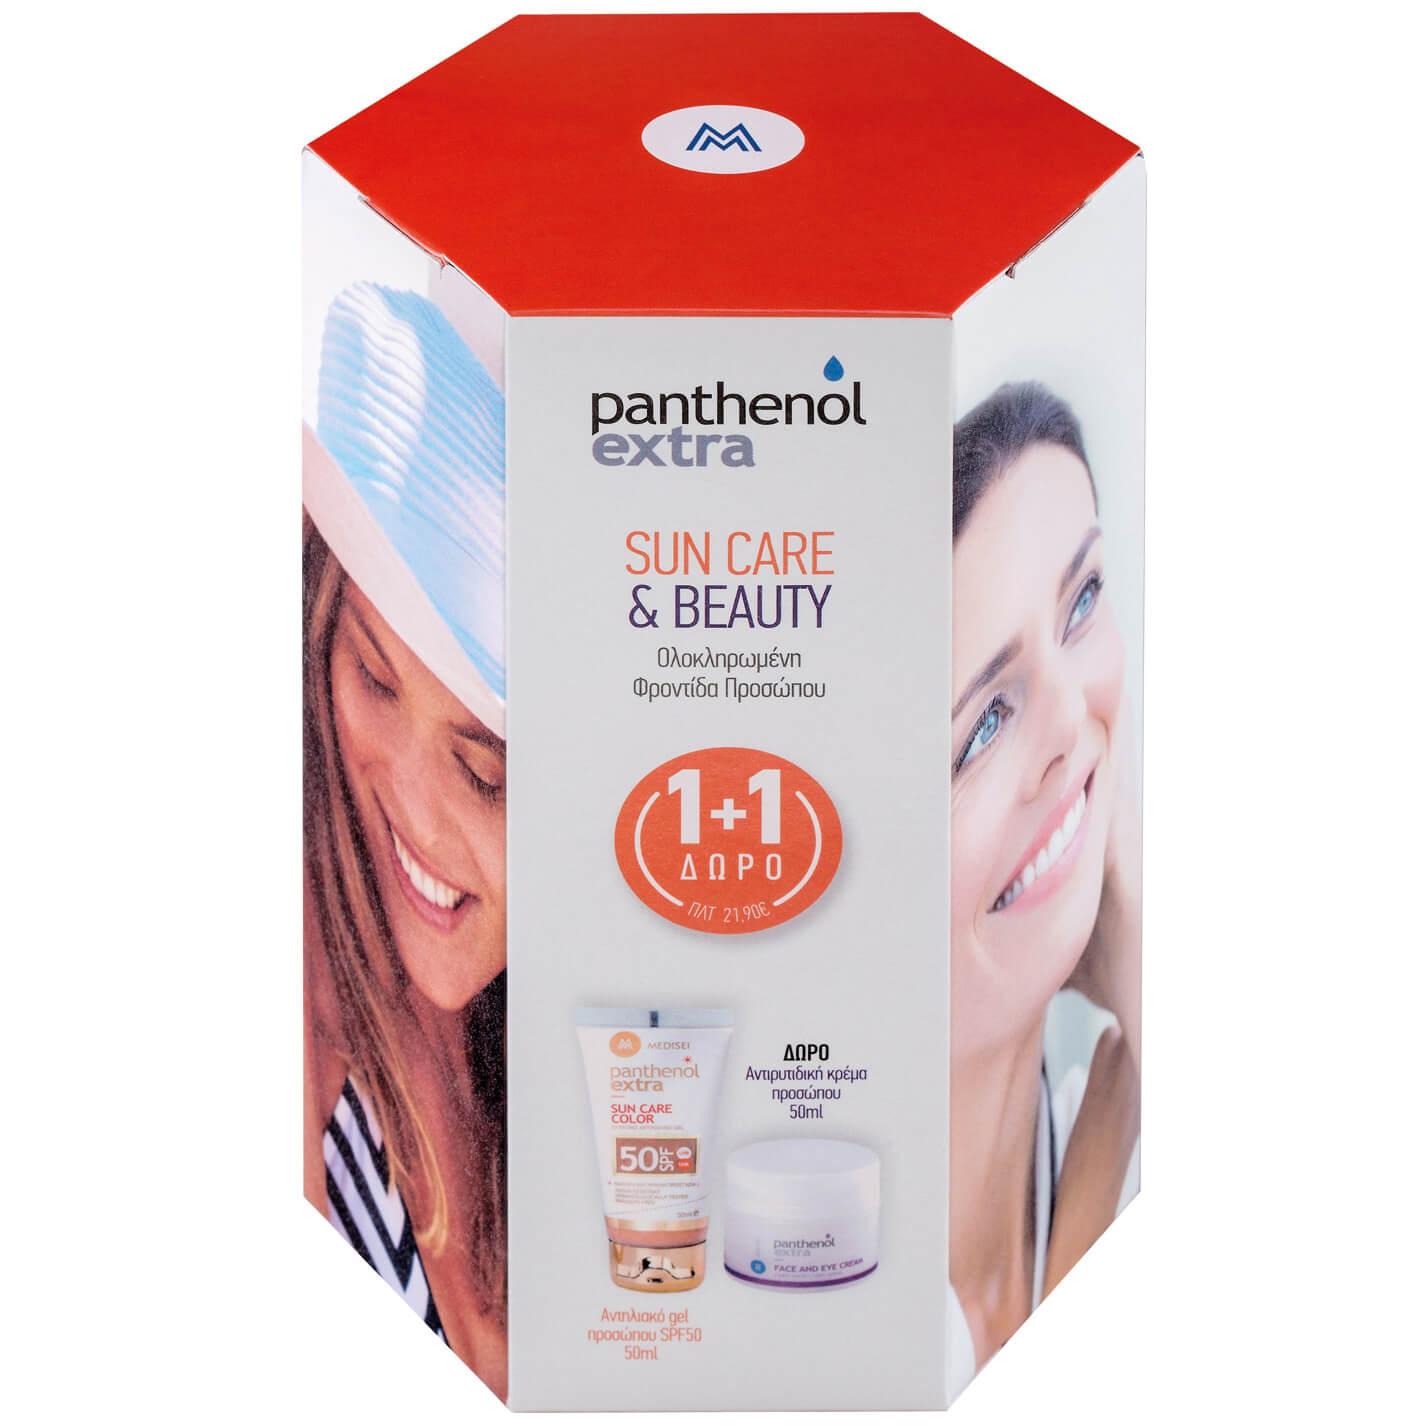 Panthenol Extra Πακέτο Προσφοράς Sun Care Color Spf50Αντηλιακή Προστασία με Χρώμα 50ml& Δώρο 24ωρη Αντιρυτιδική Κρέμα 50ml